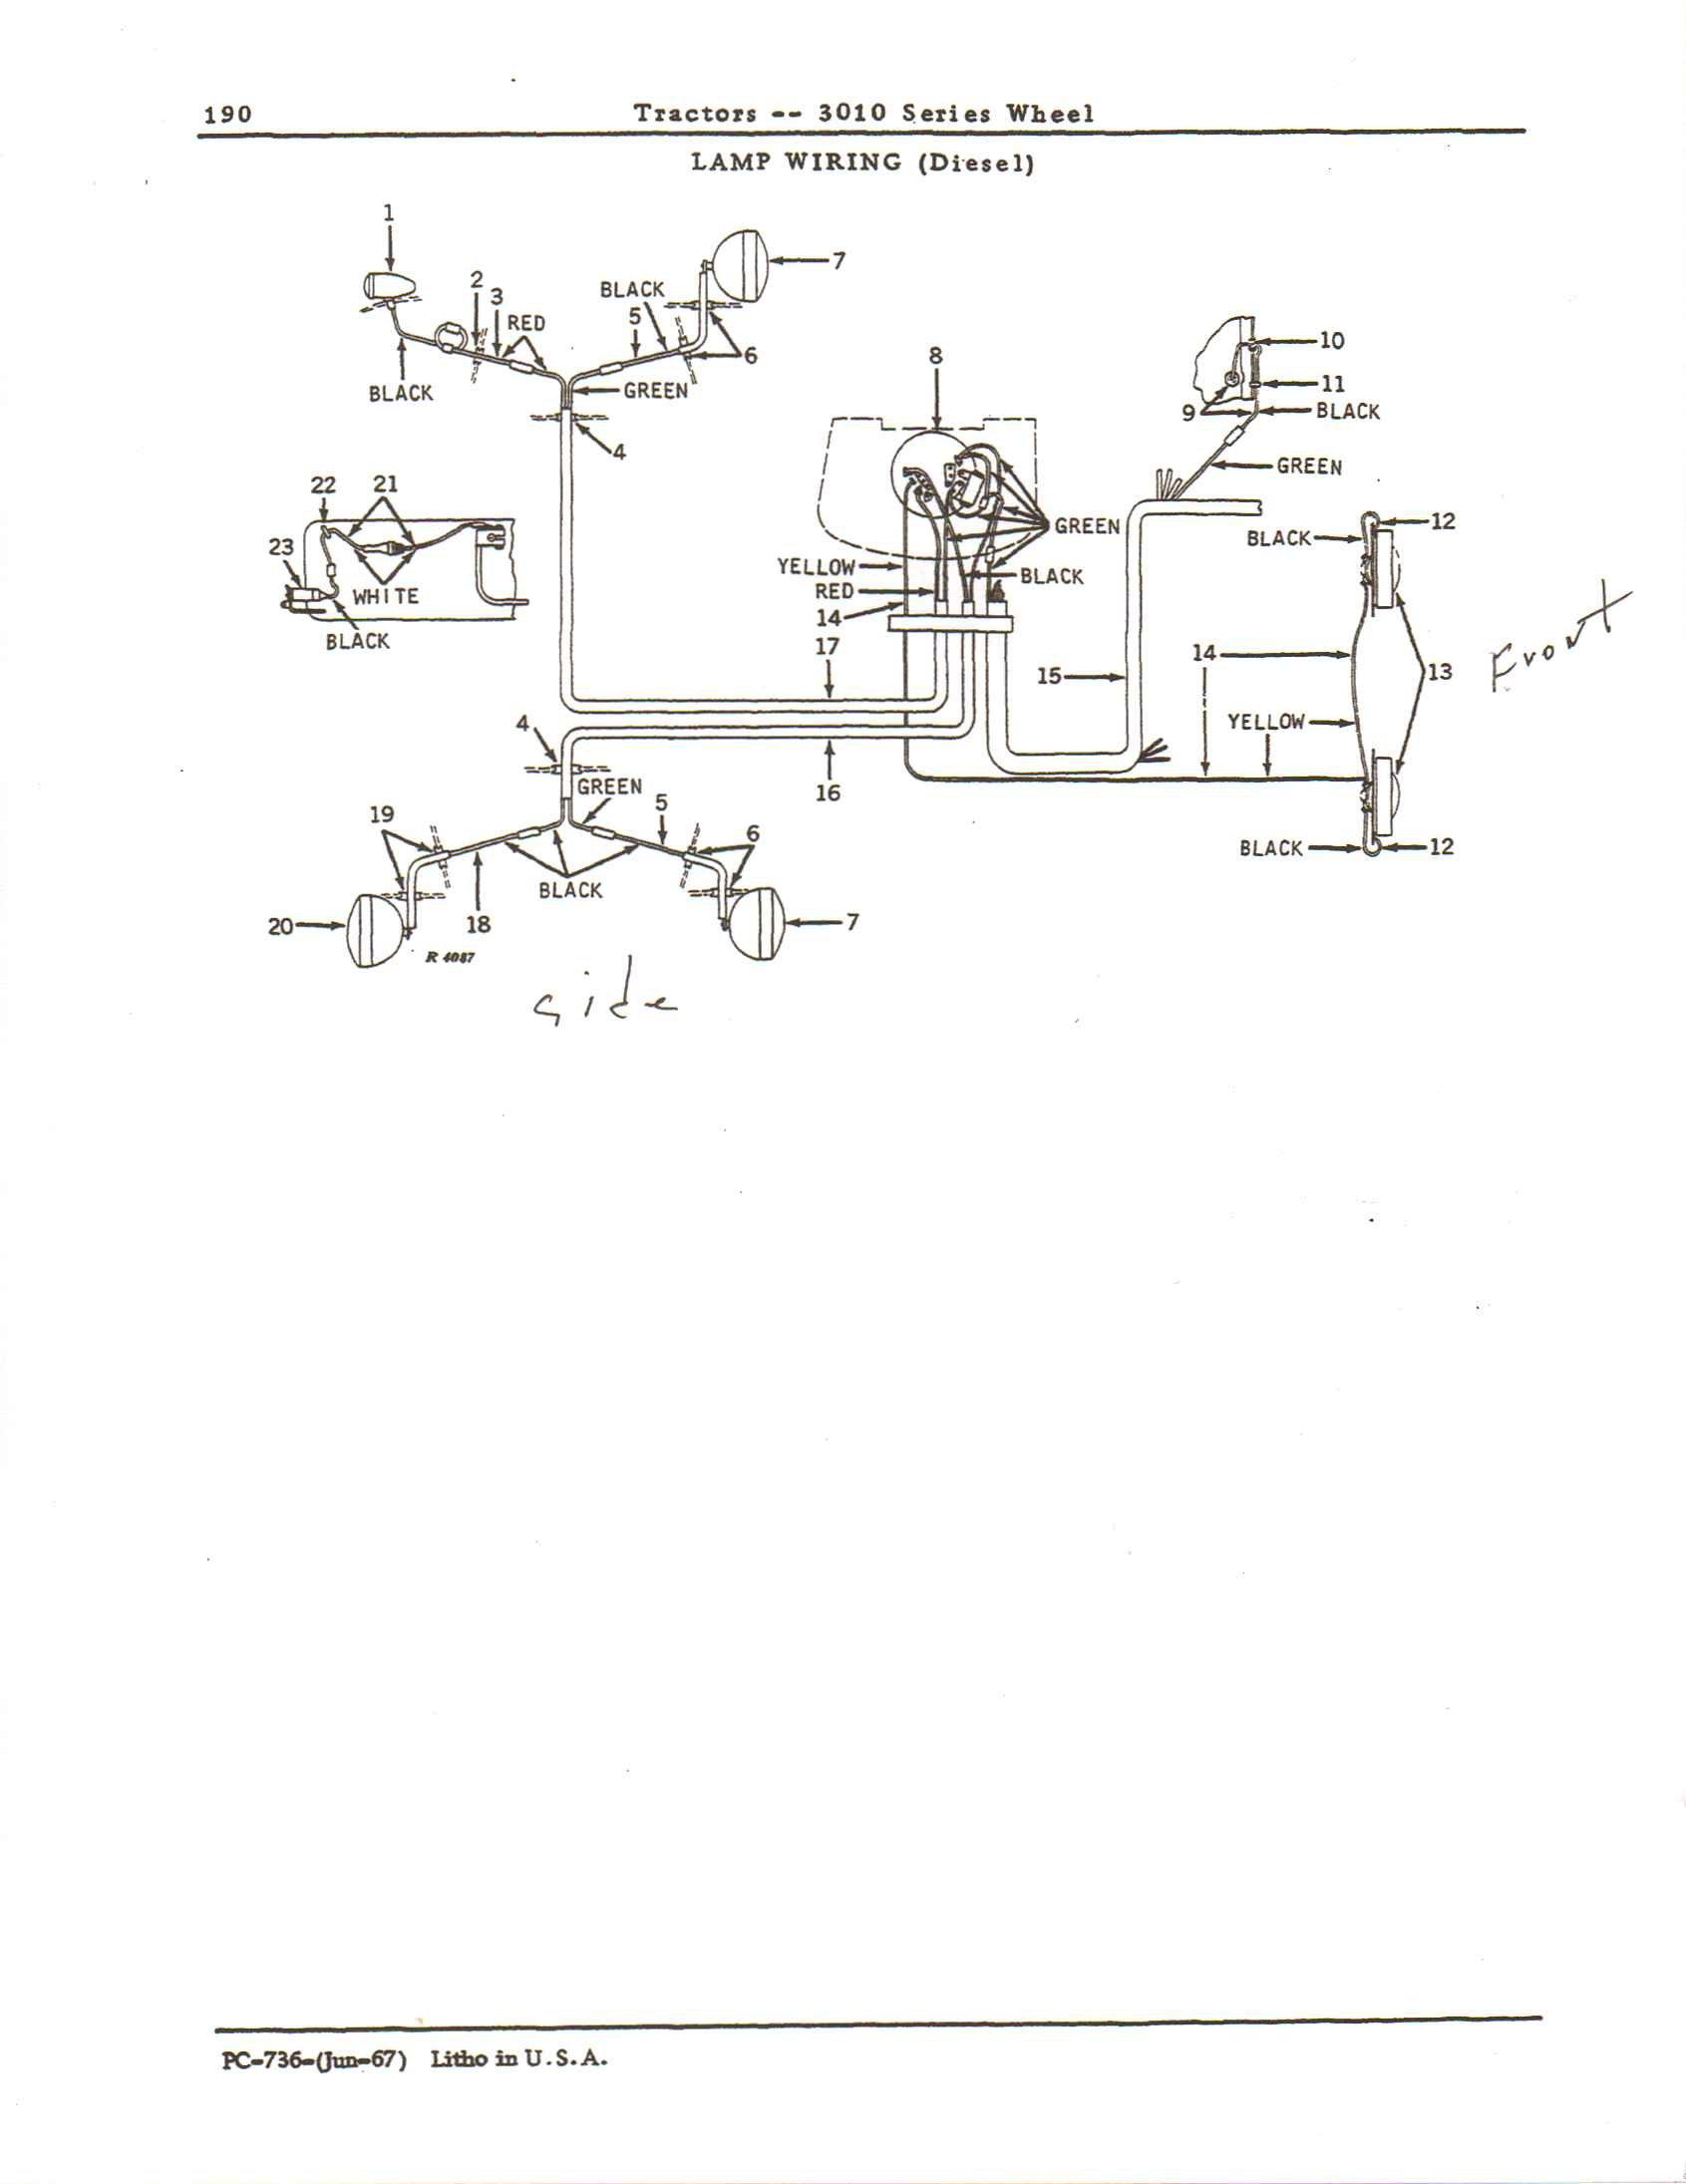 john deere 3010 24 volt wiring diagram